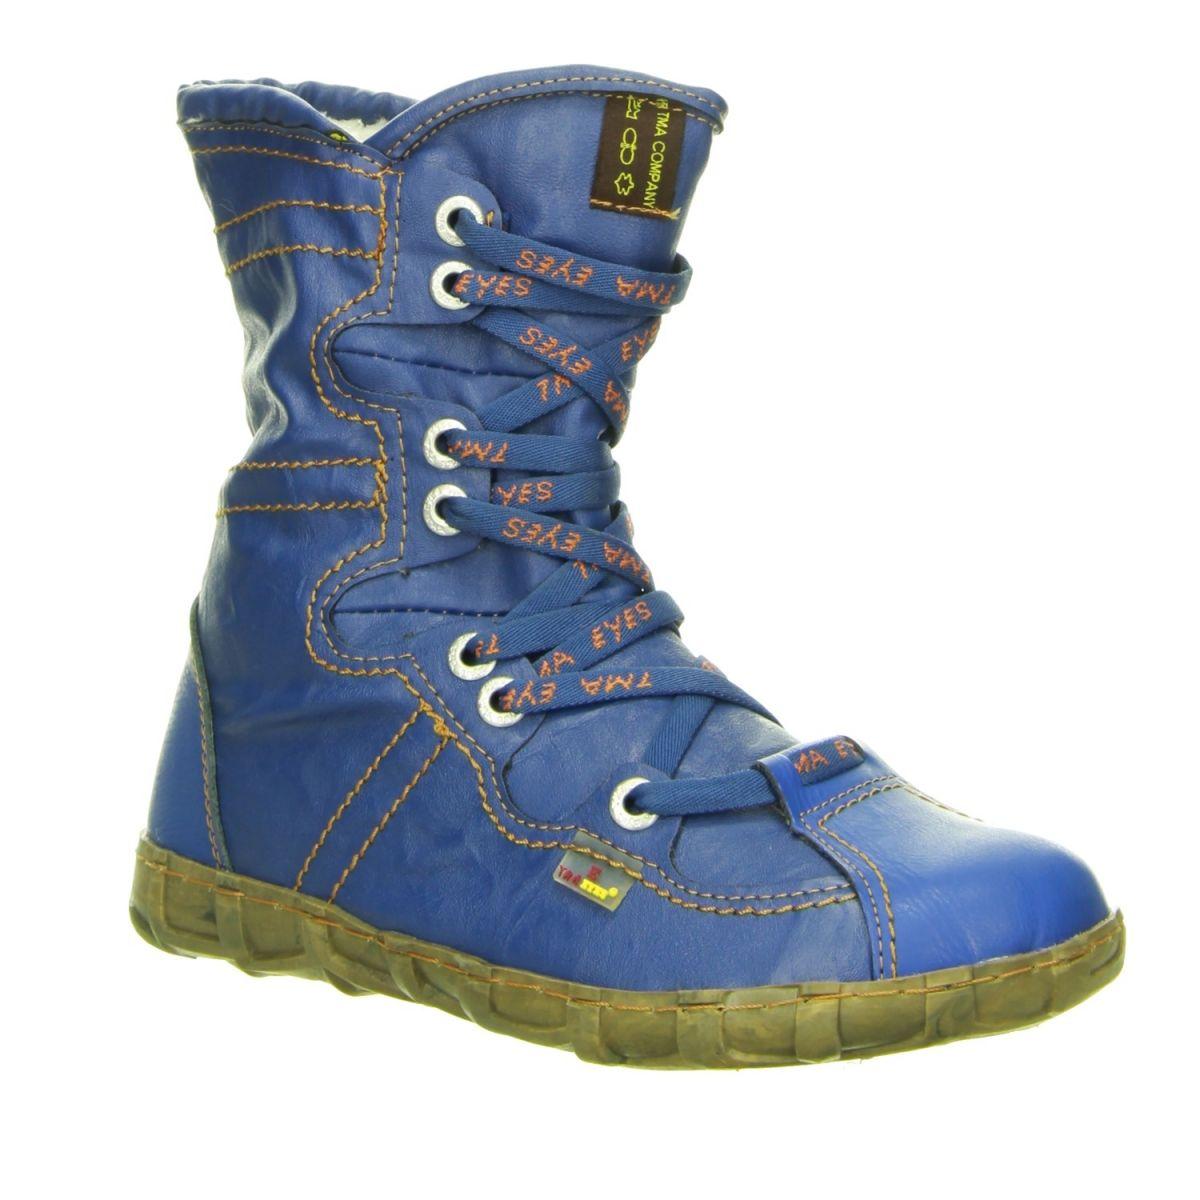 TMA Warmfutter - Warmfutter-Boots Blau im Salamander Onlineshop - 271.611 632023